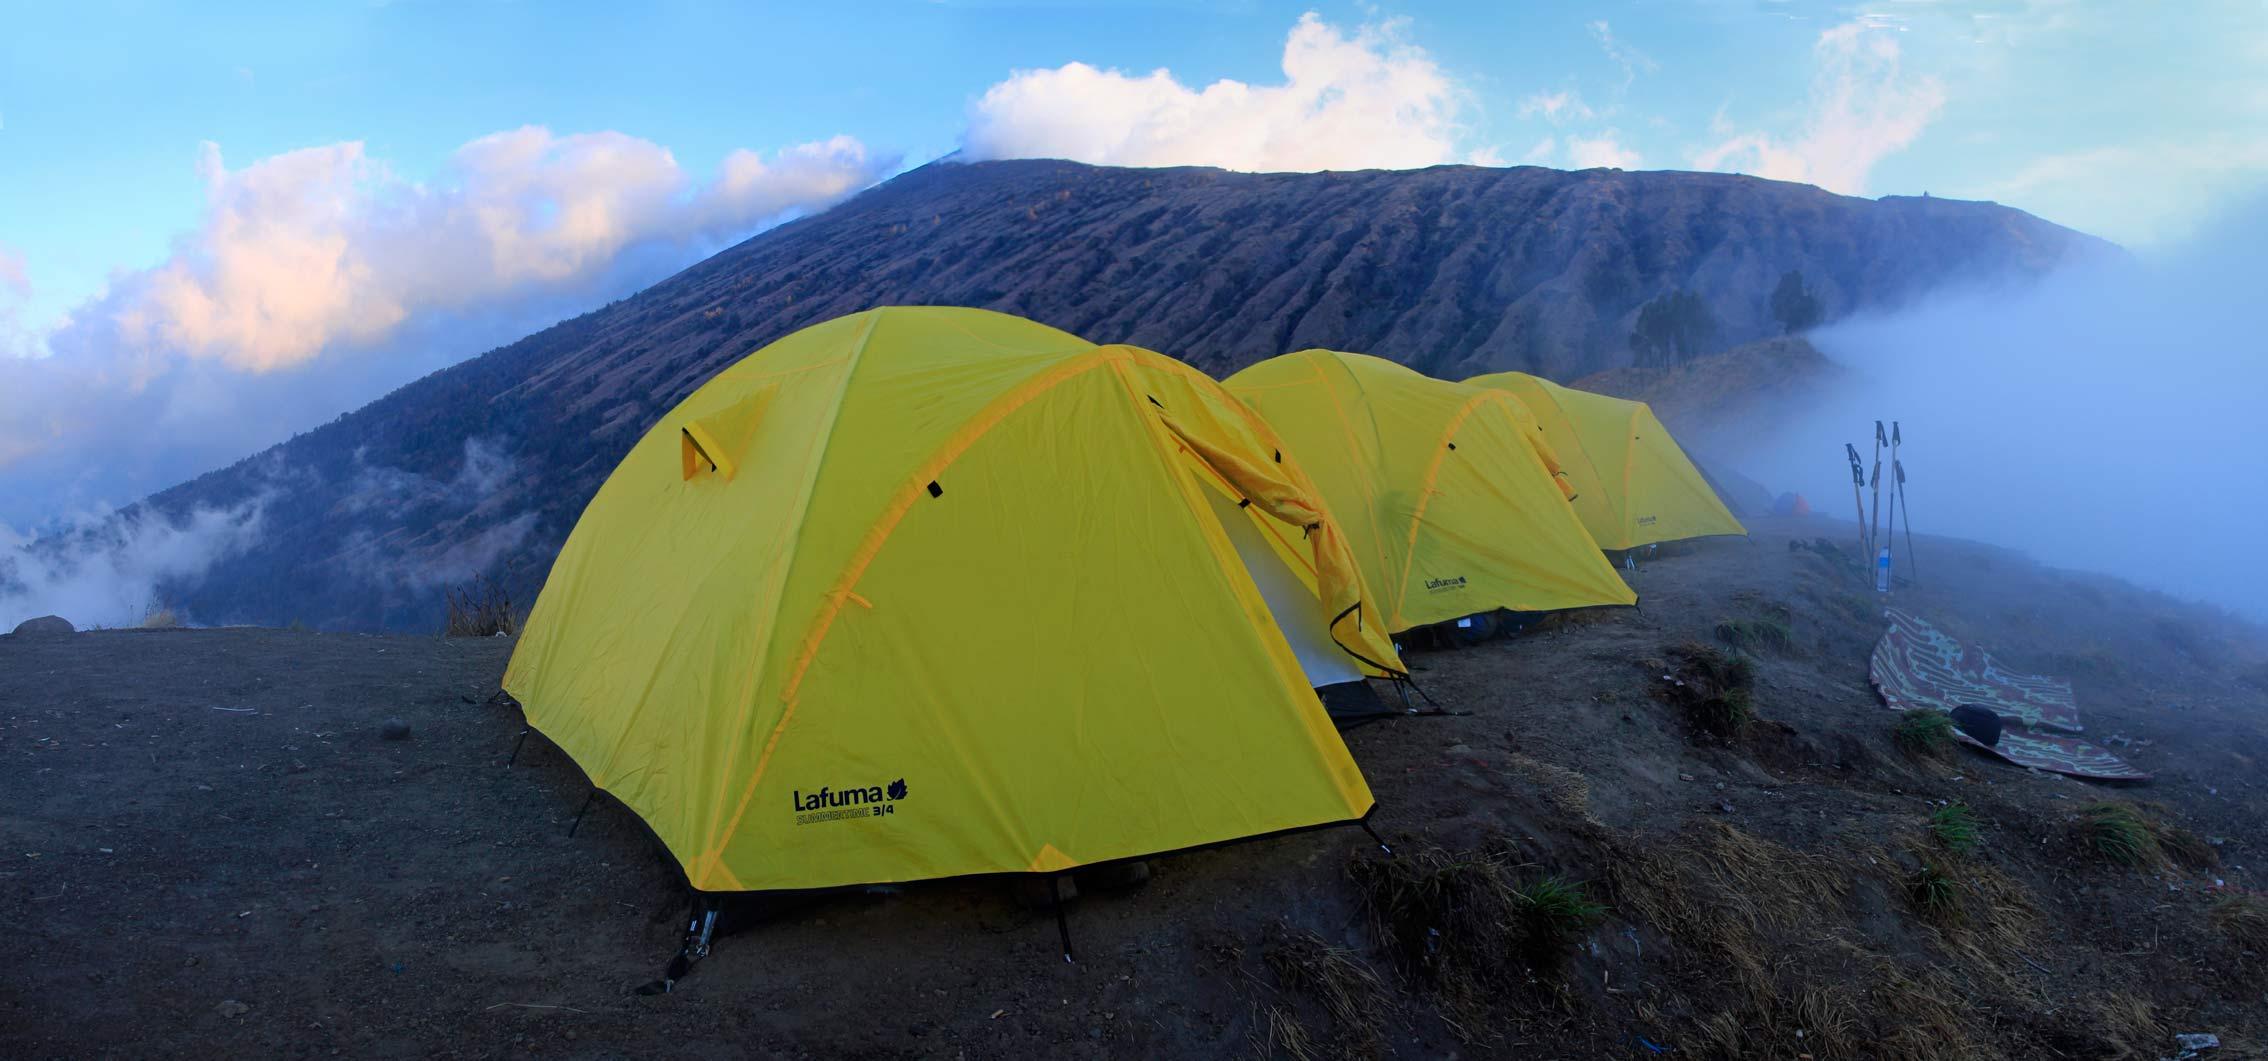 Camping on Sembalun crater rim, Mount Rinjani, Lombok ...